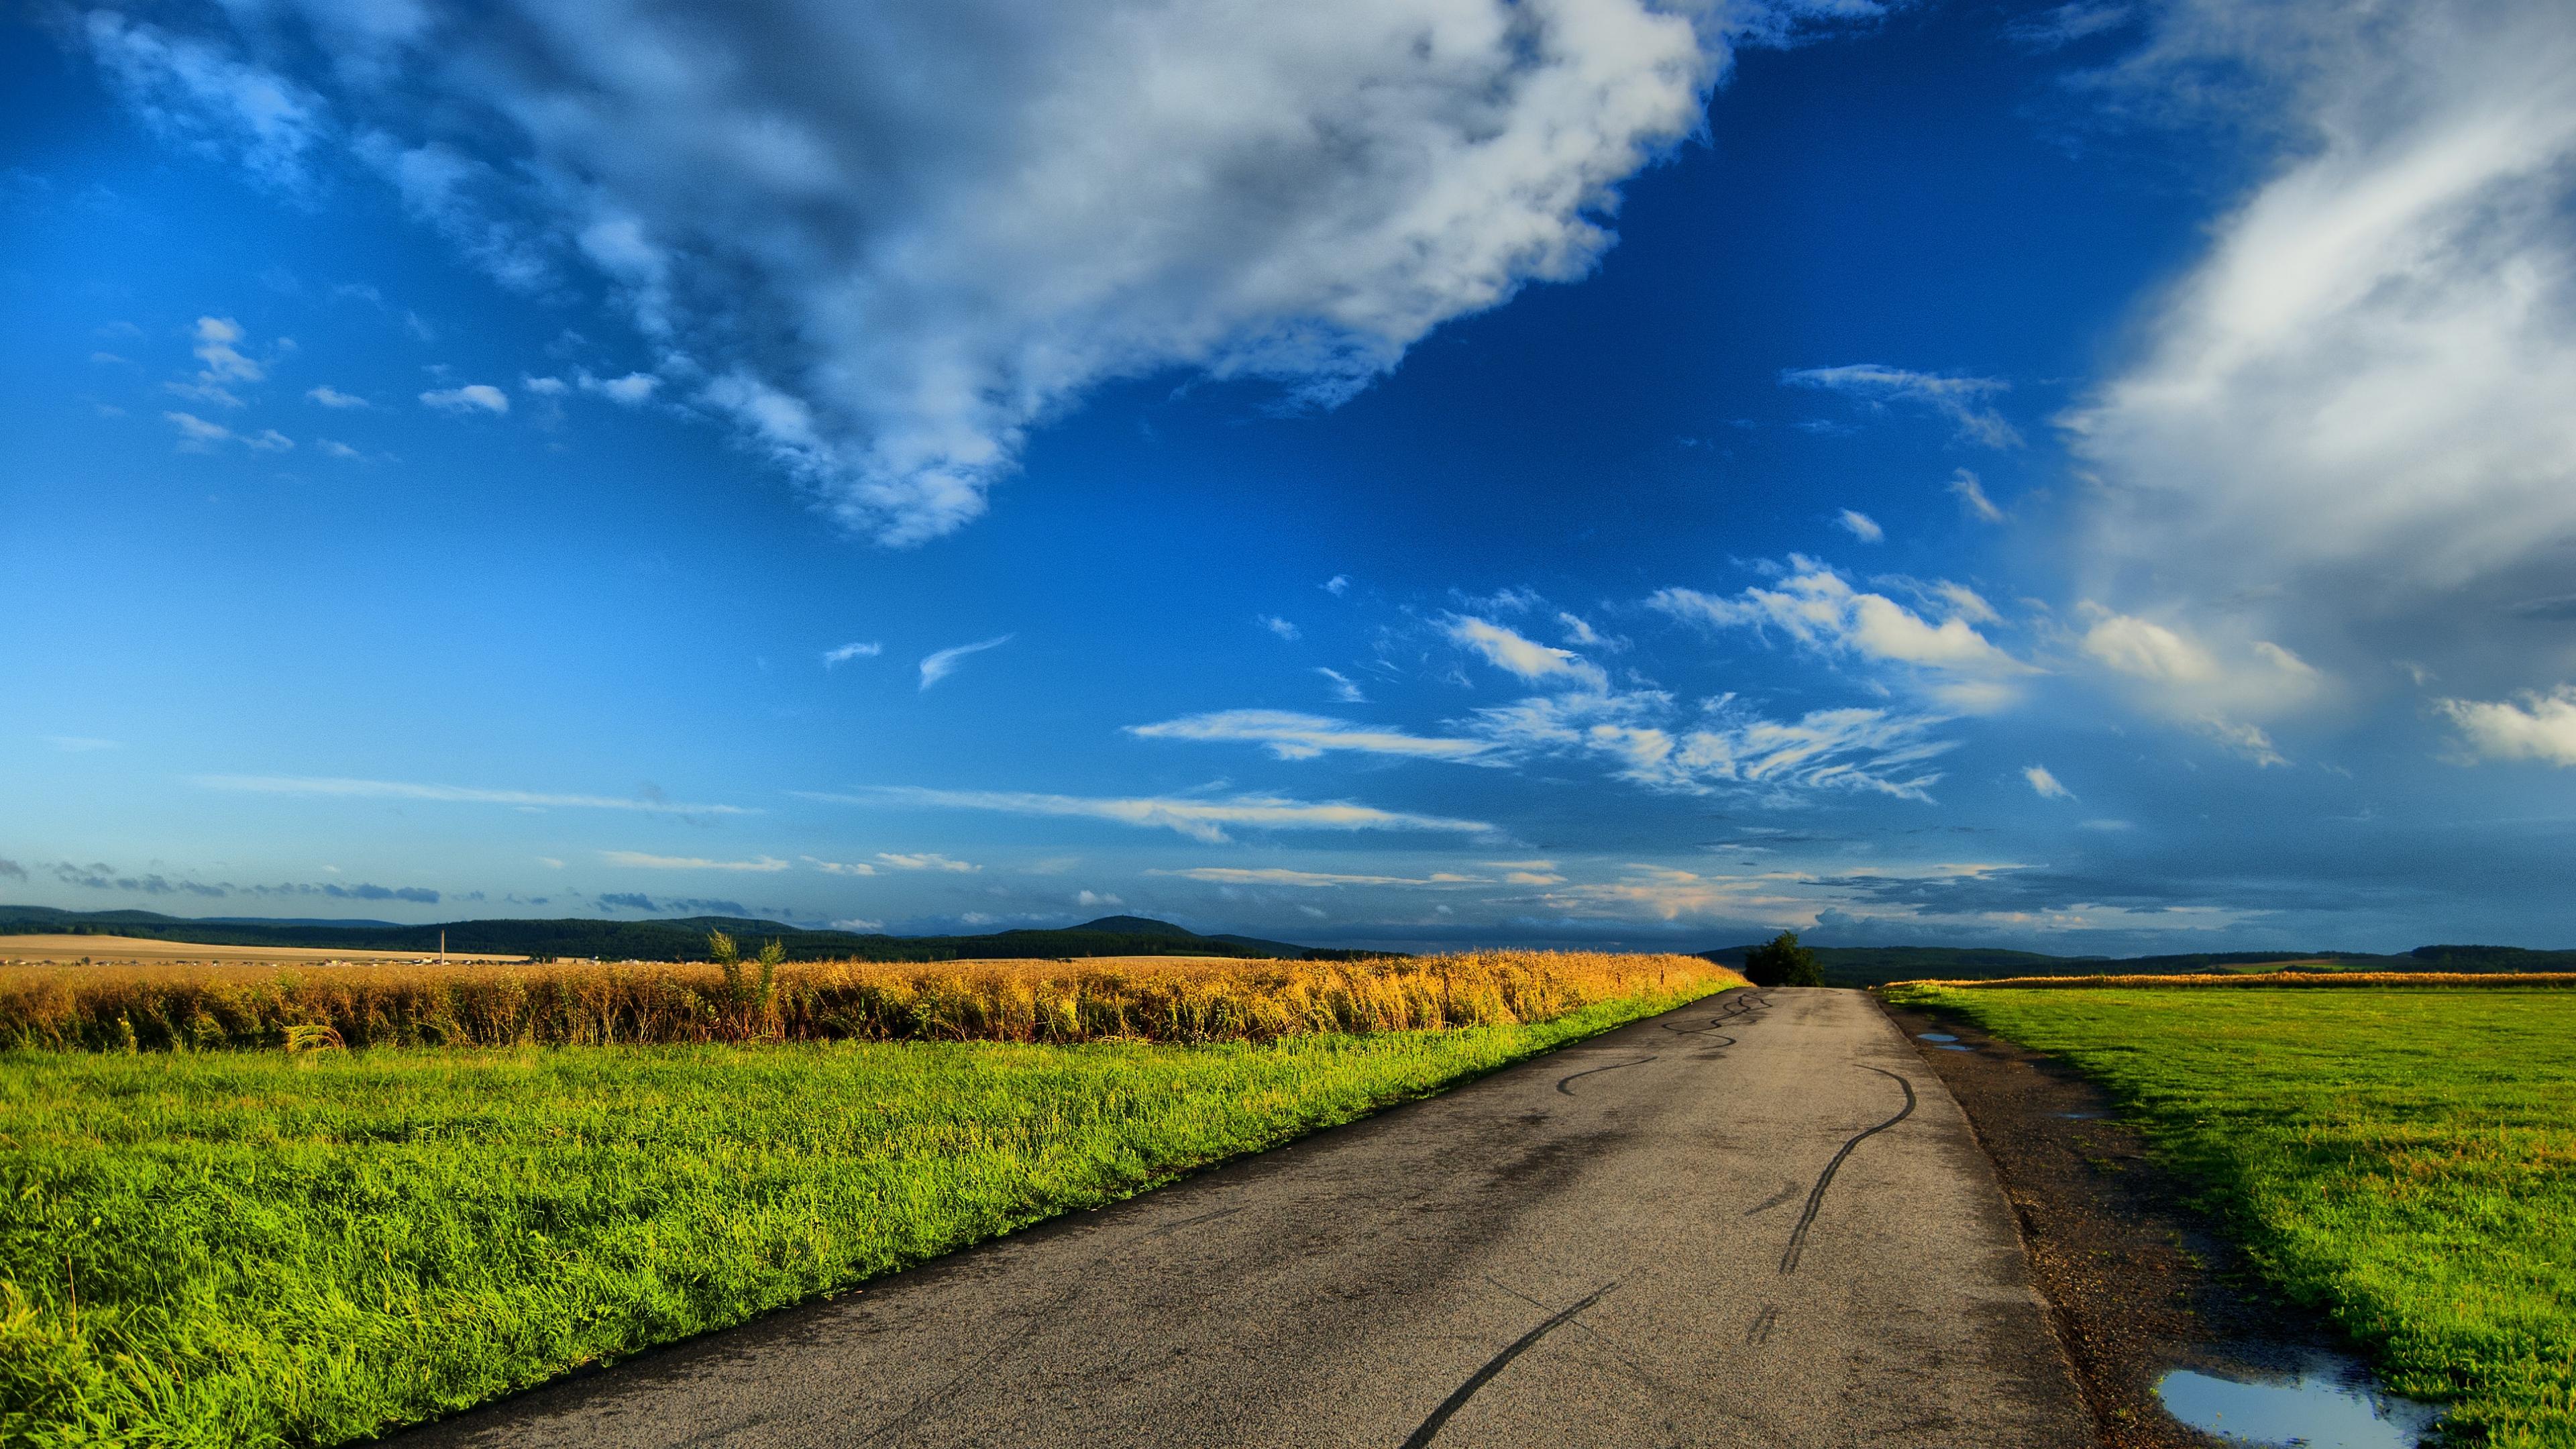 Wallpaper 38402160 field road puddles landscape 4K Ultra HD HD 3840x2160